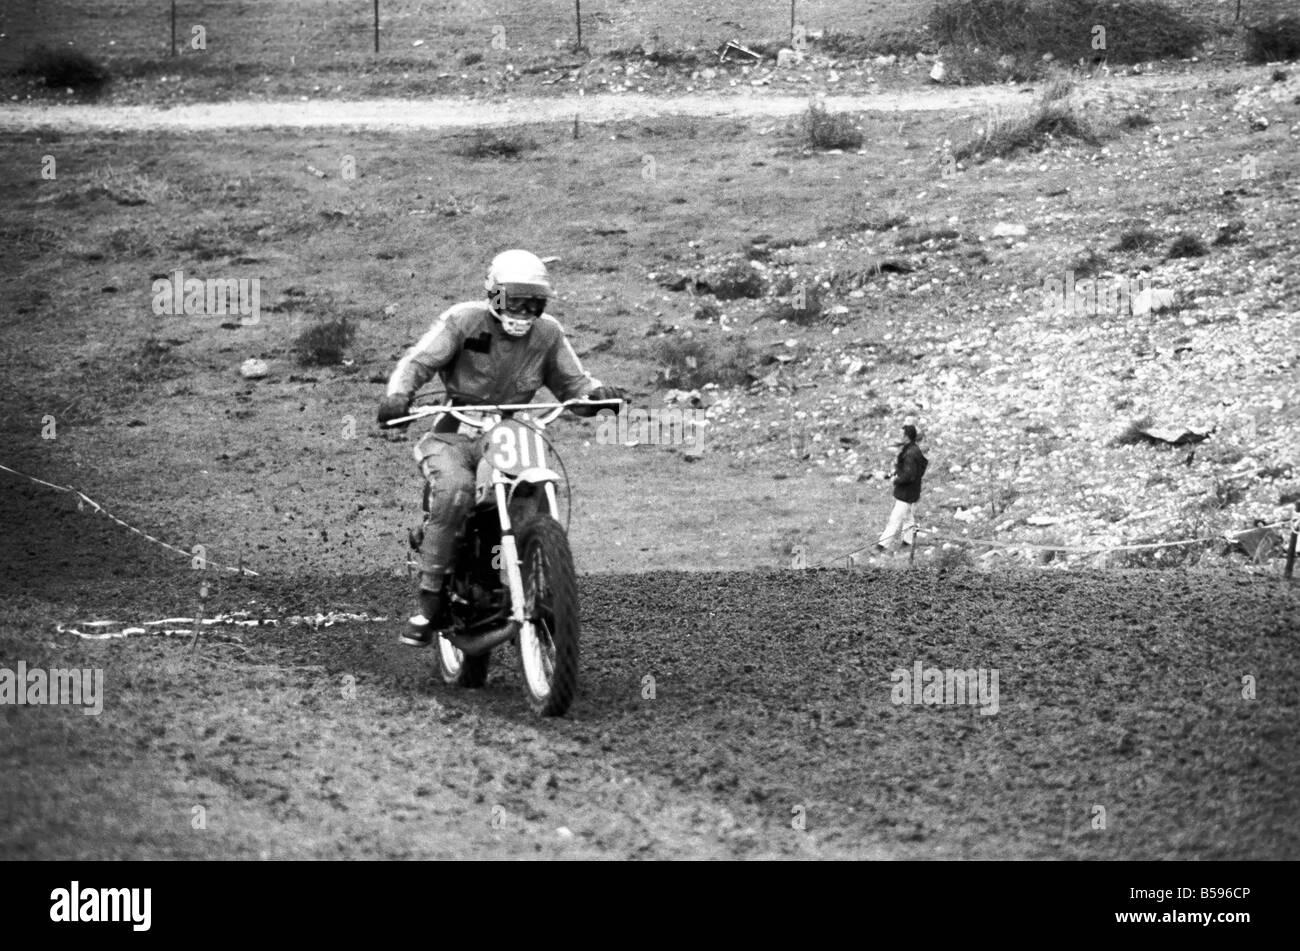 Motorsport/Children/Motorbike: Schoolboys Scramble. March 1975 75-01212-003 - Stock Image